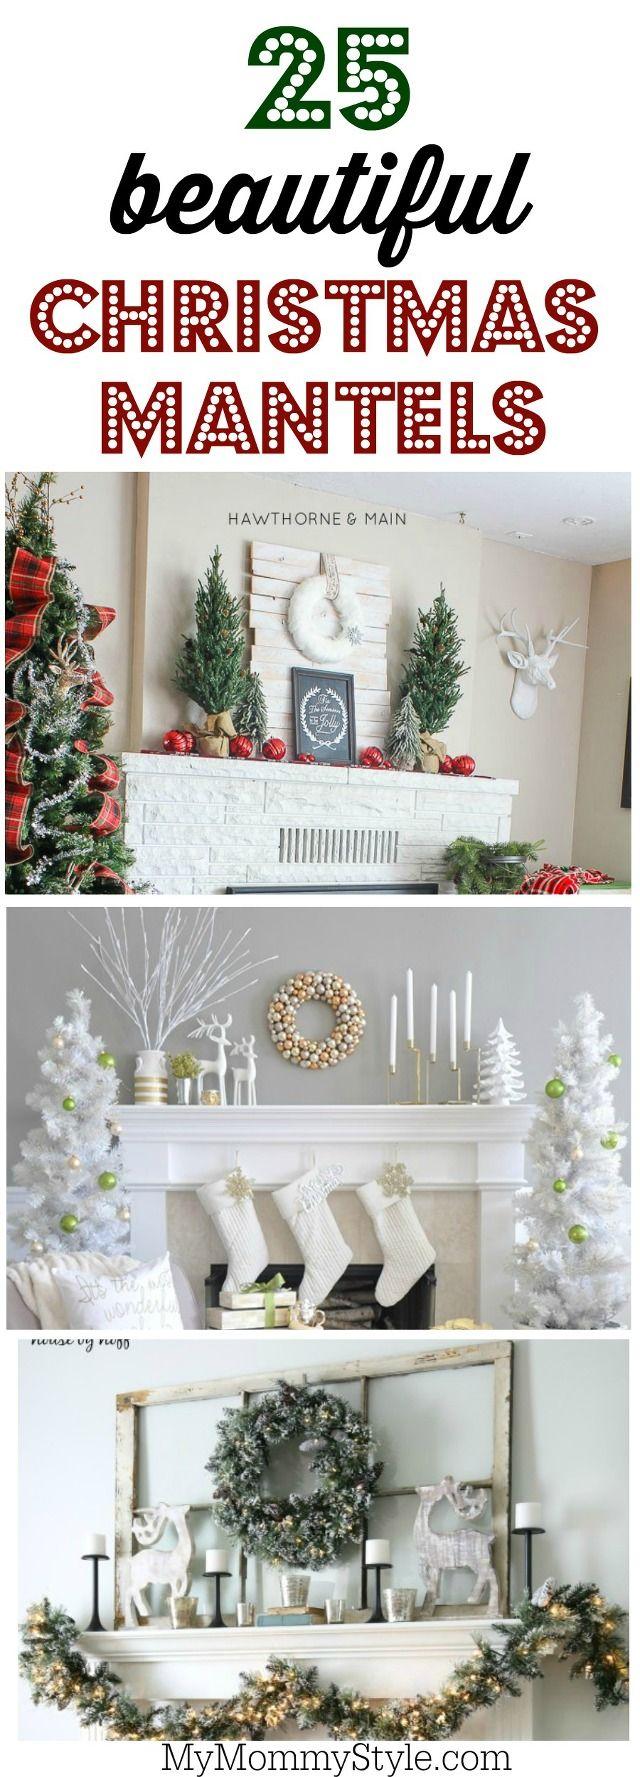 25 beautiful Christmas mantel decorating ideas